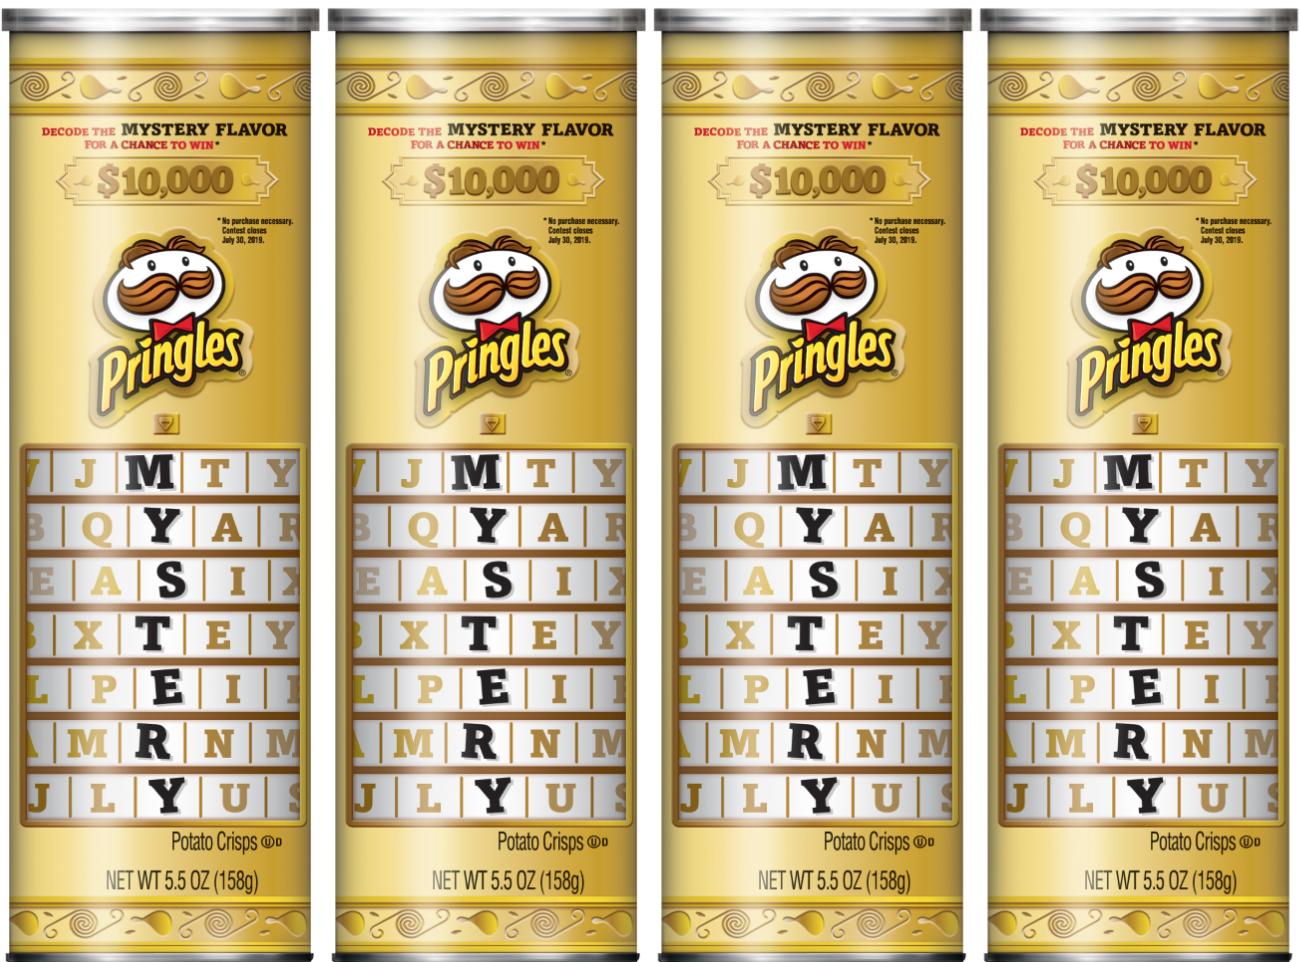 pringles-mystery-flavor